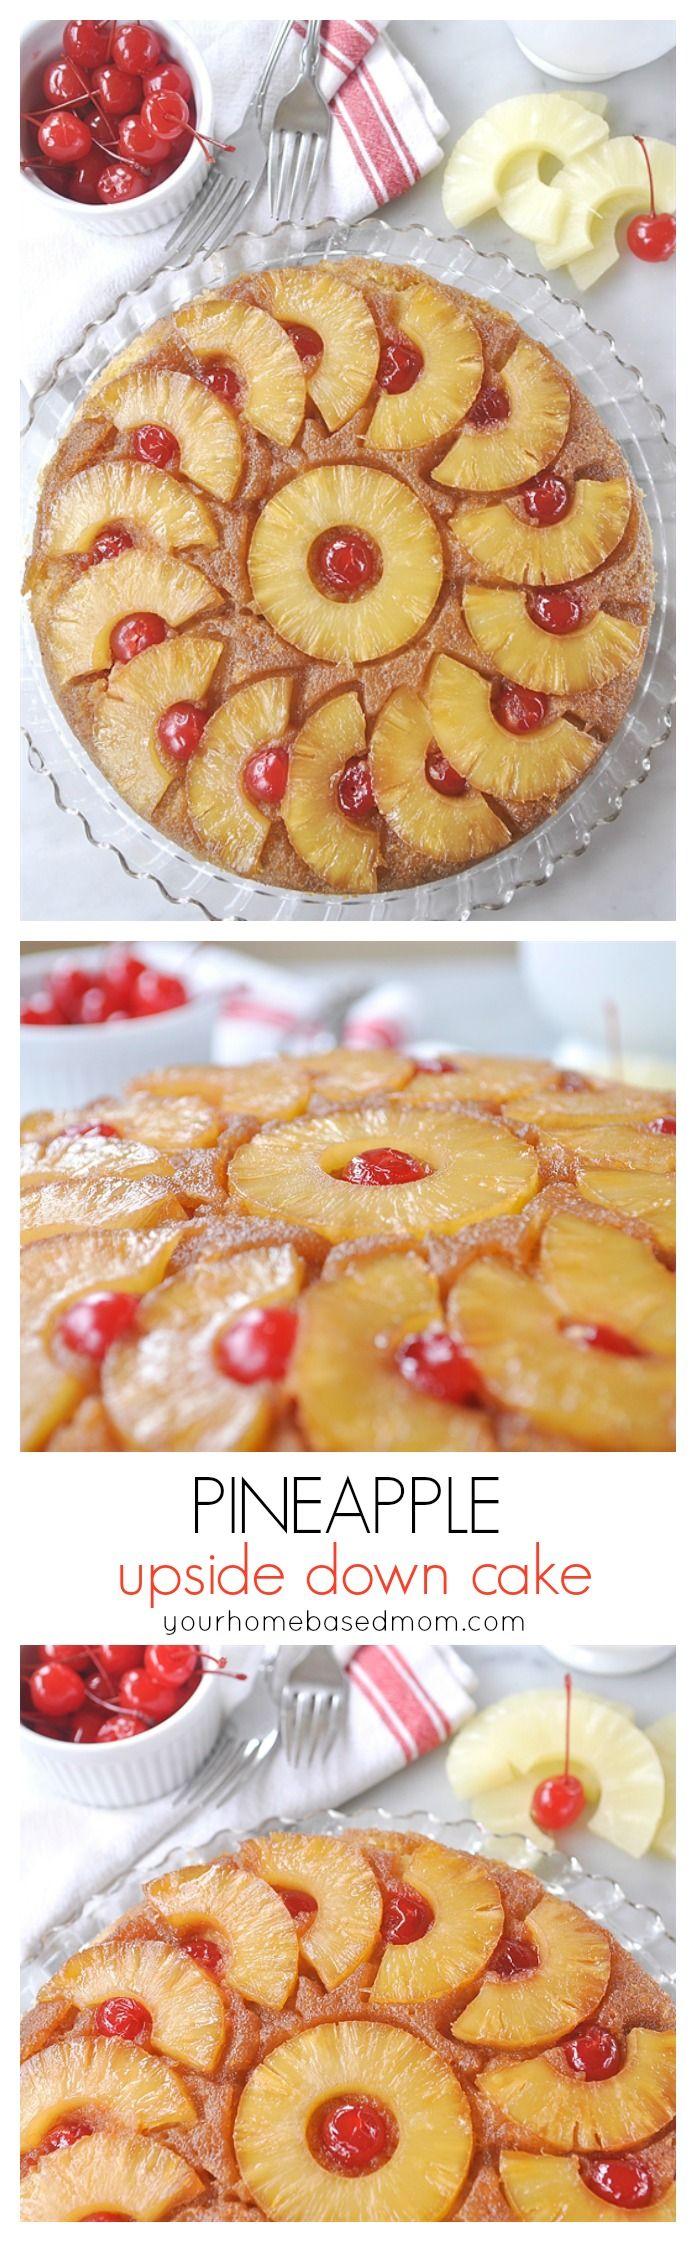 Pineapple Upside Down Cake - a family favorite @yourhomebasedmom.com